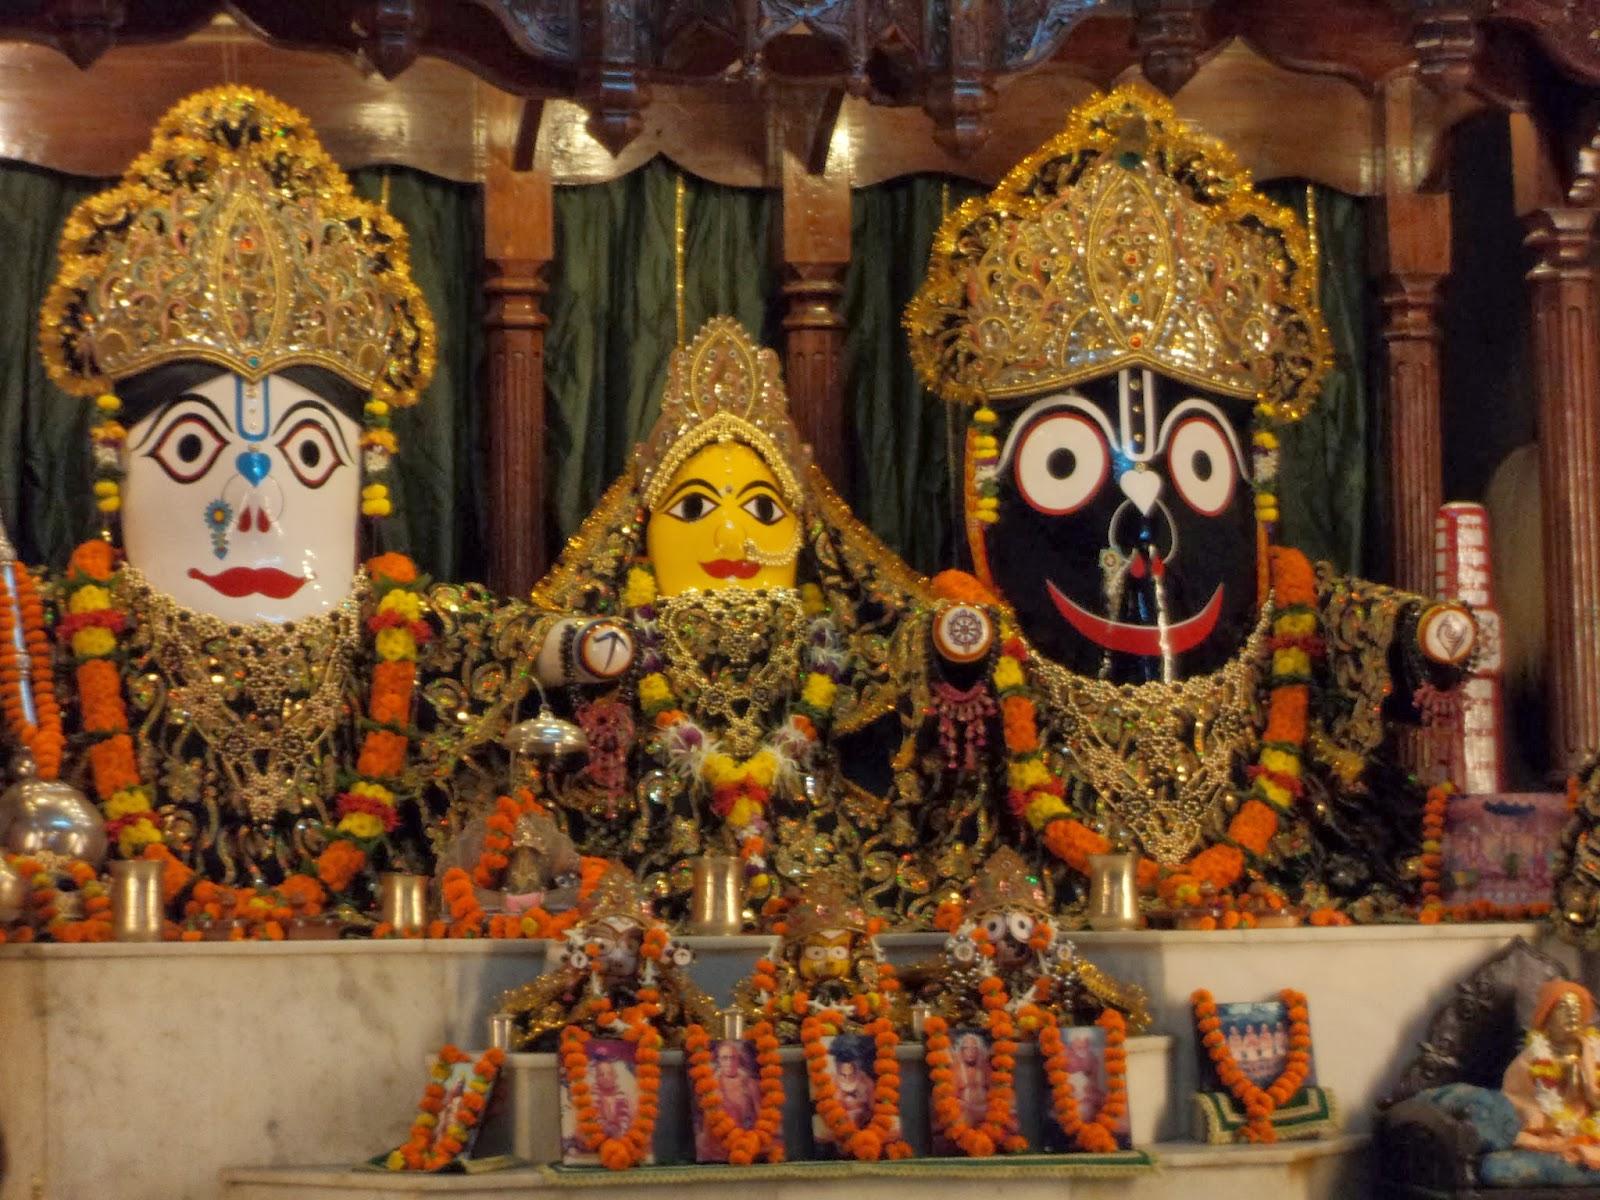 Amazing Wallpaper Lord Jagannath Puri - DSC05192  Snapshot_132779.JPG